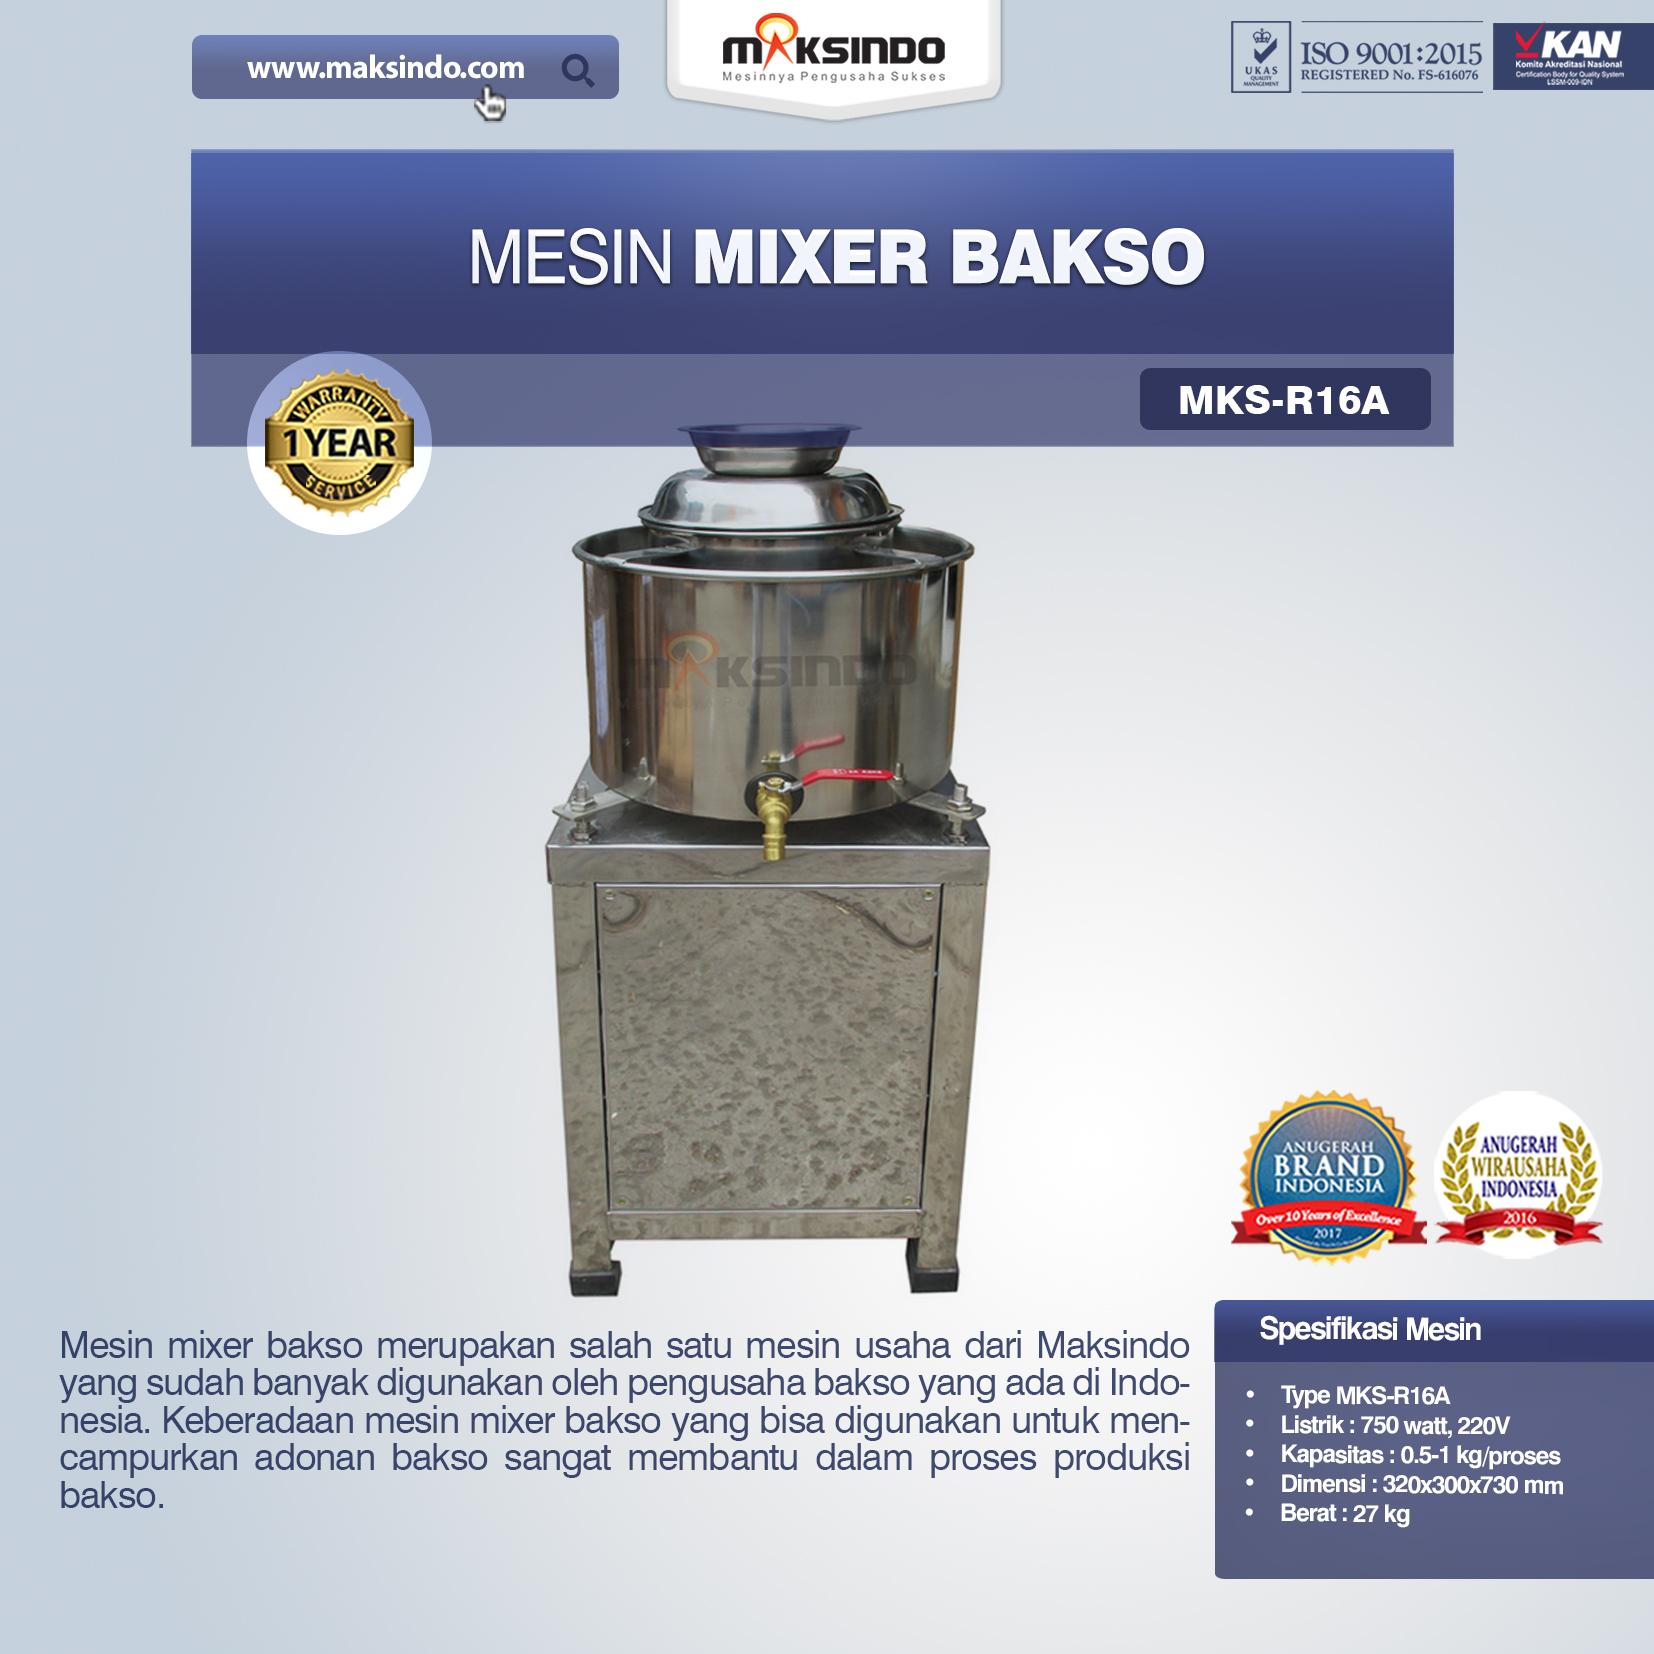 Jual Mesin Mixer BaksoMKS-R16A, MKS-R23A di Pekanbaru